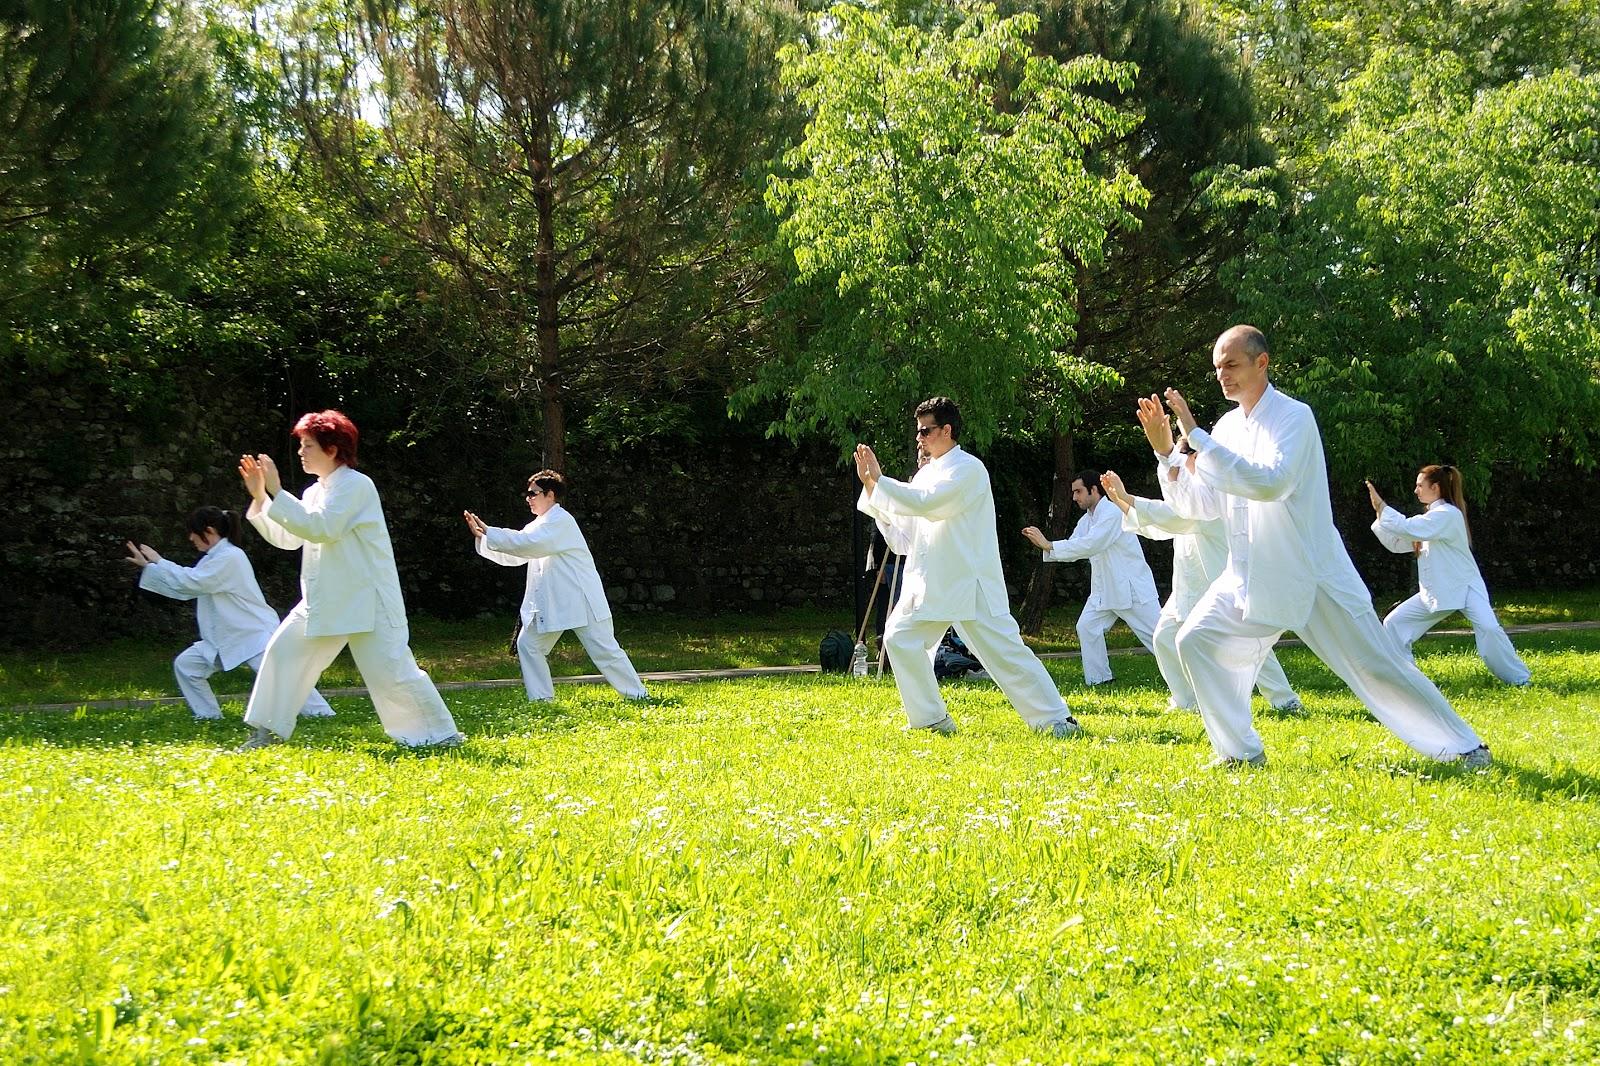 Taï Chi : les participants en tenue blanche s'entraînent dehors